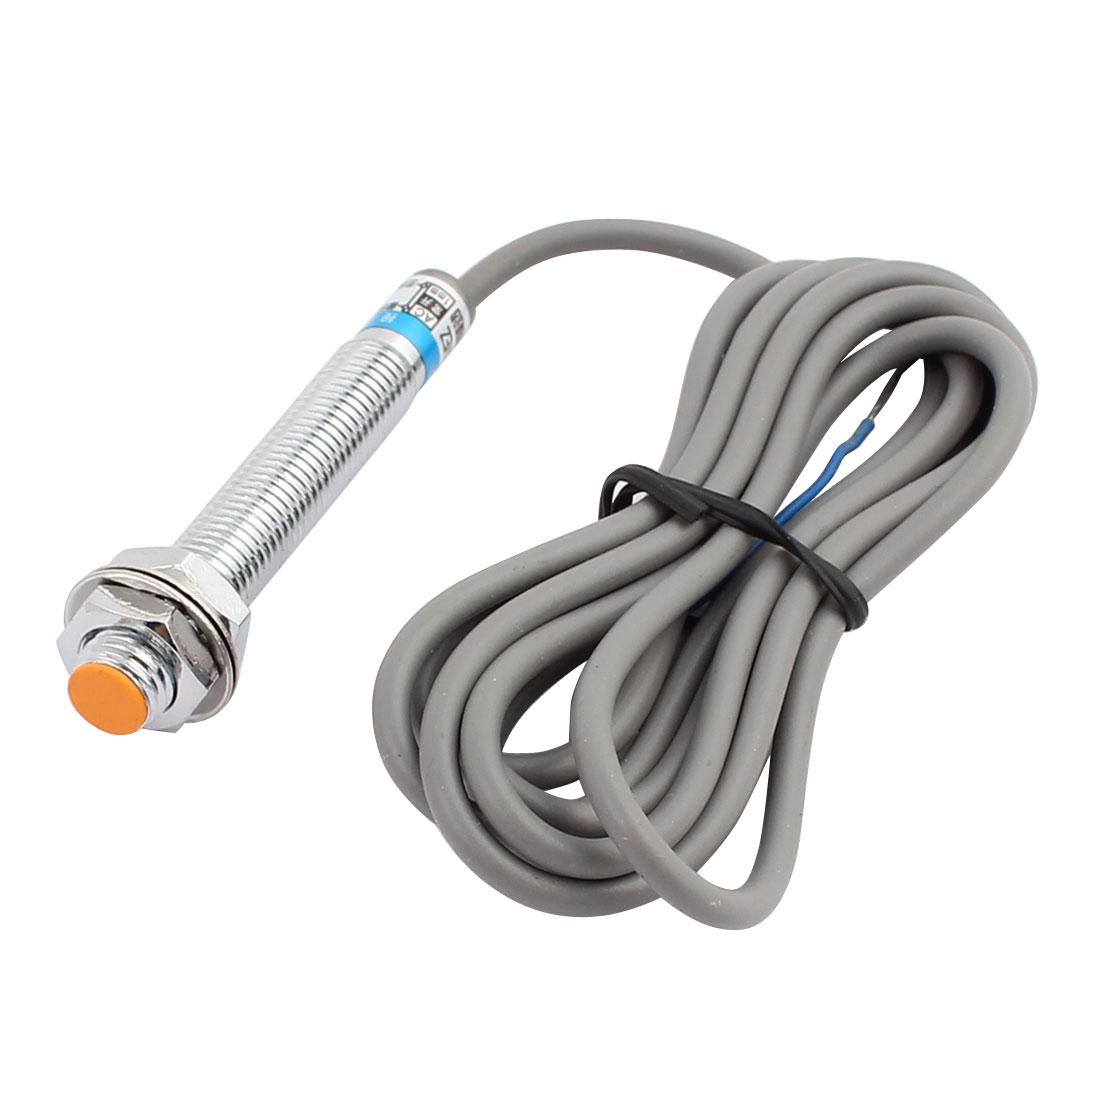 LJ8A3-1-J/EZ AC90-250V 400mA NPN NO 1mm Inductive Proximity Sensor Switch 2-wire